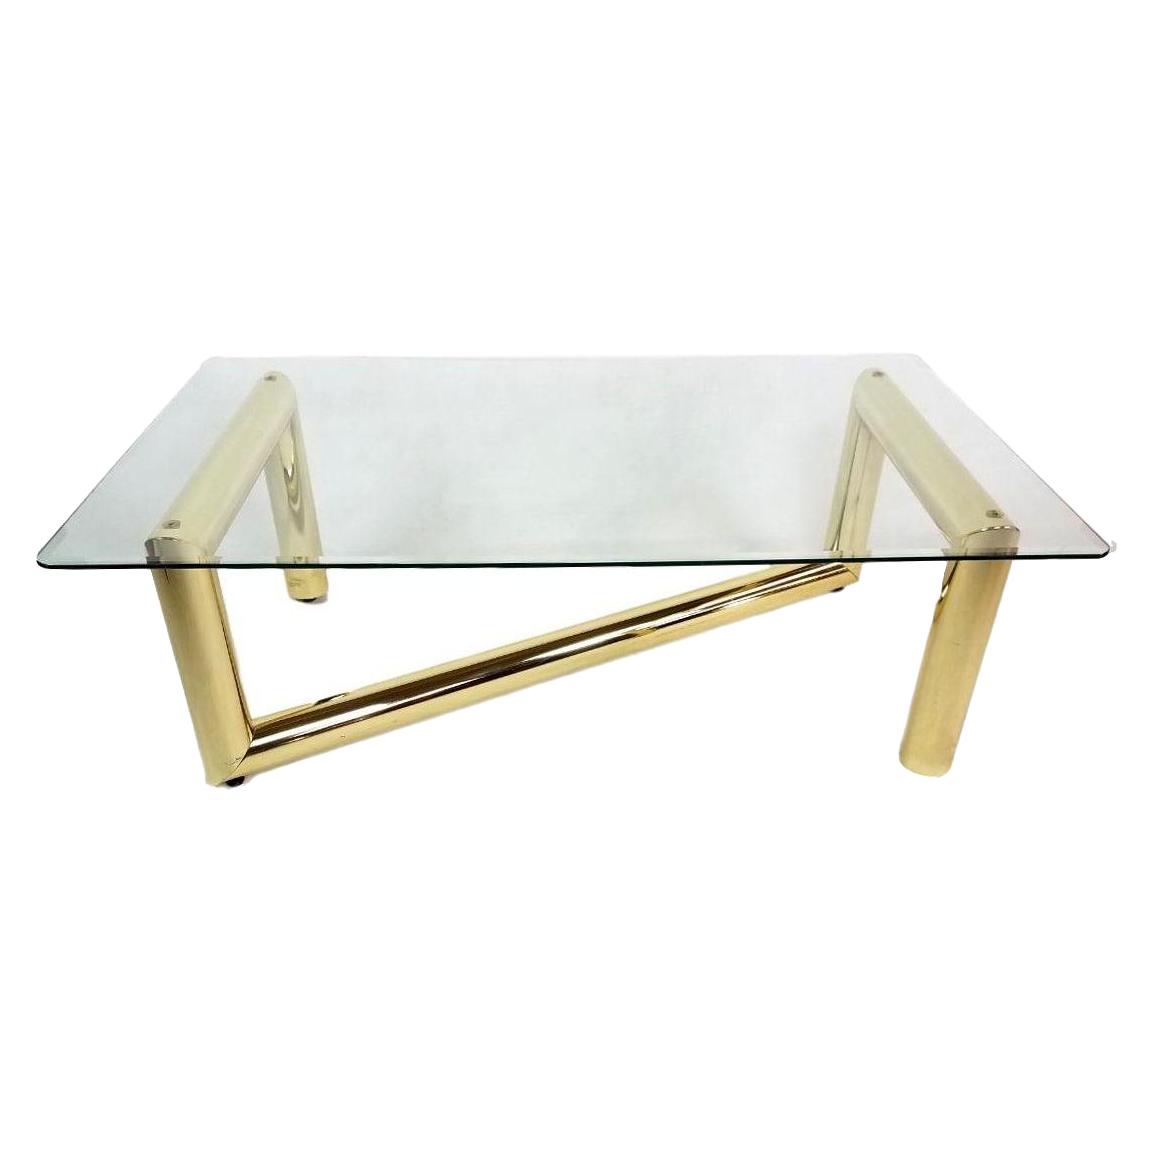 Karl Springer Tubular Brass Z Shaped Coffee Table